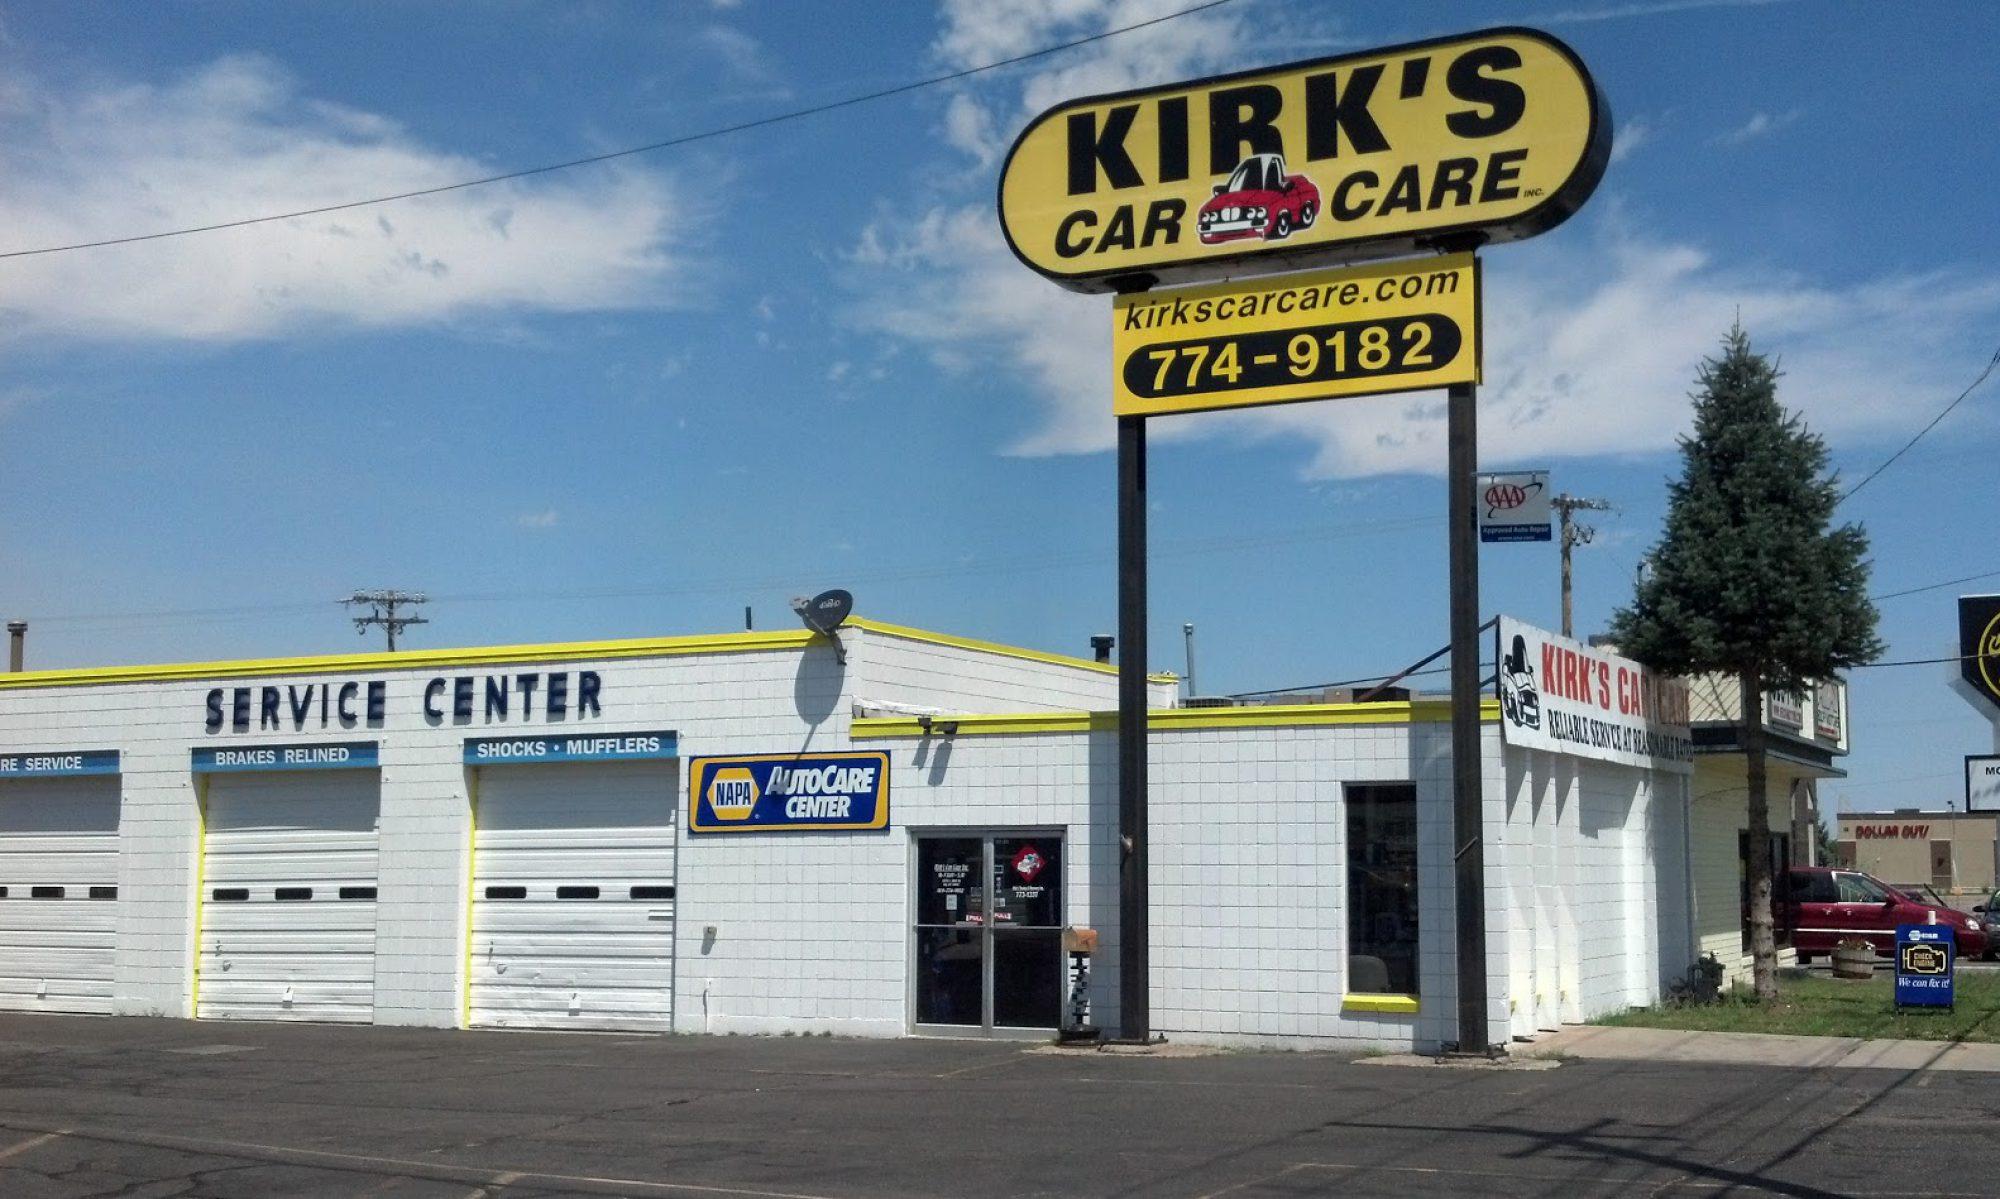 Kirk's Car Care